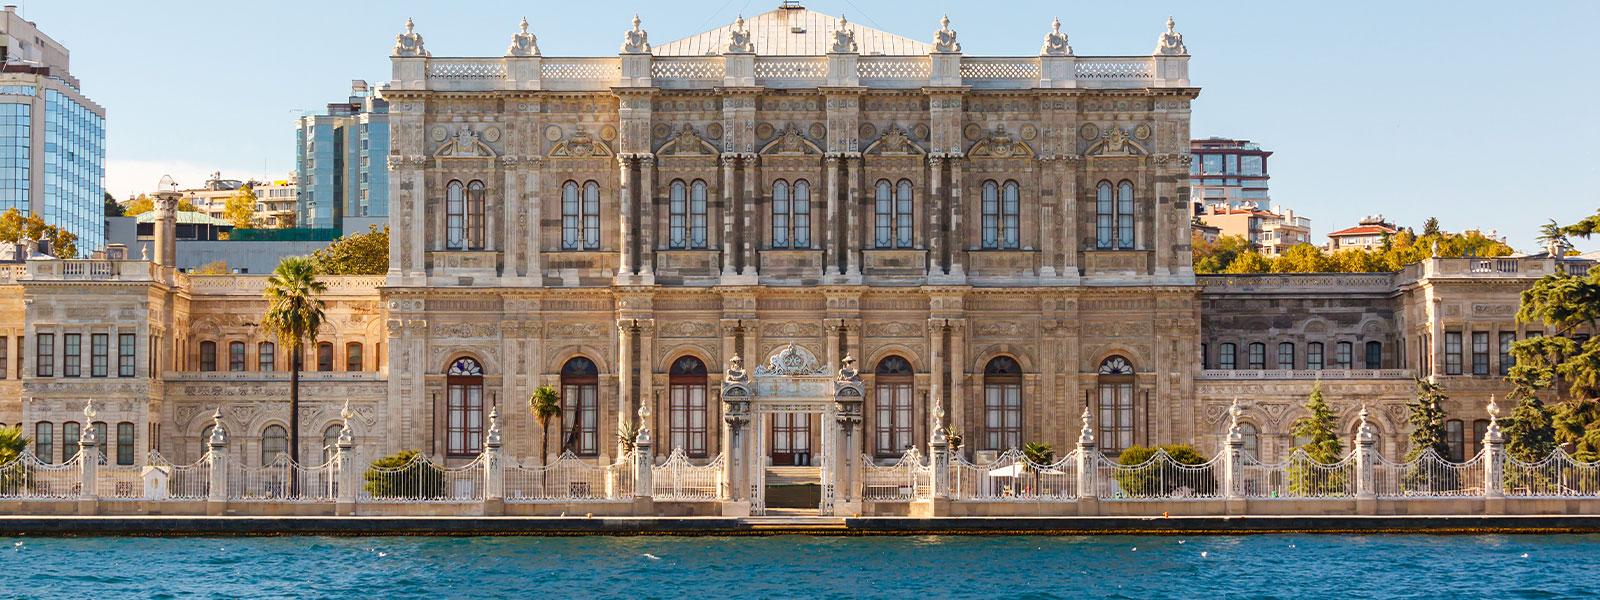 Dolmabahce Palace, Istanbul Turkey